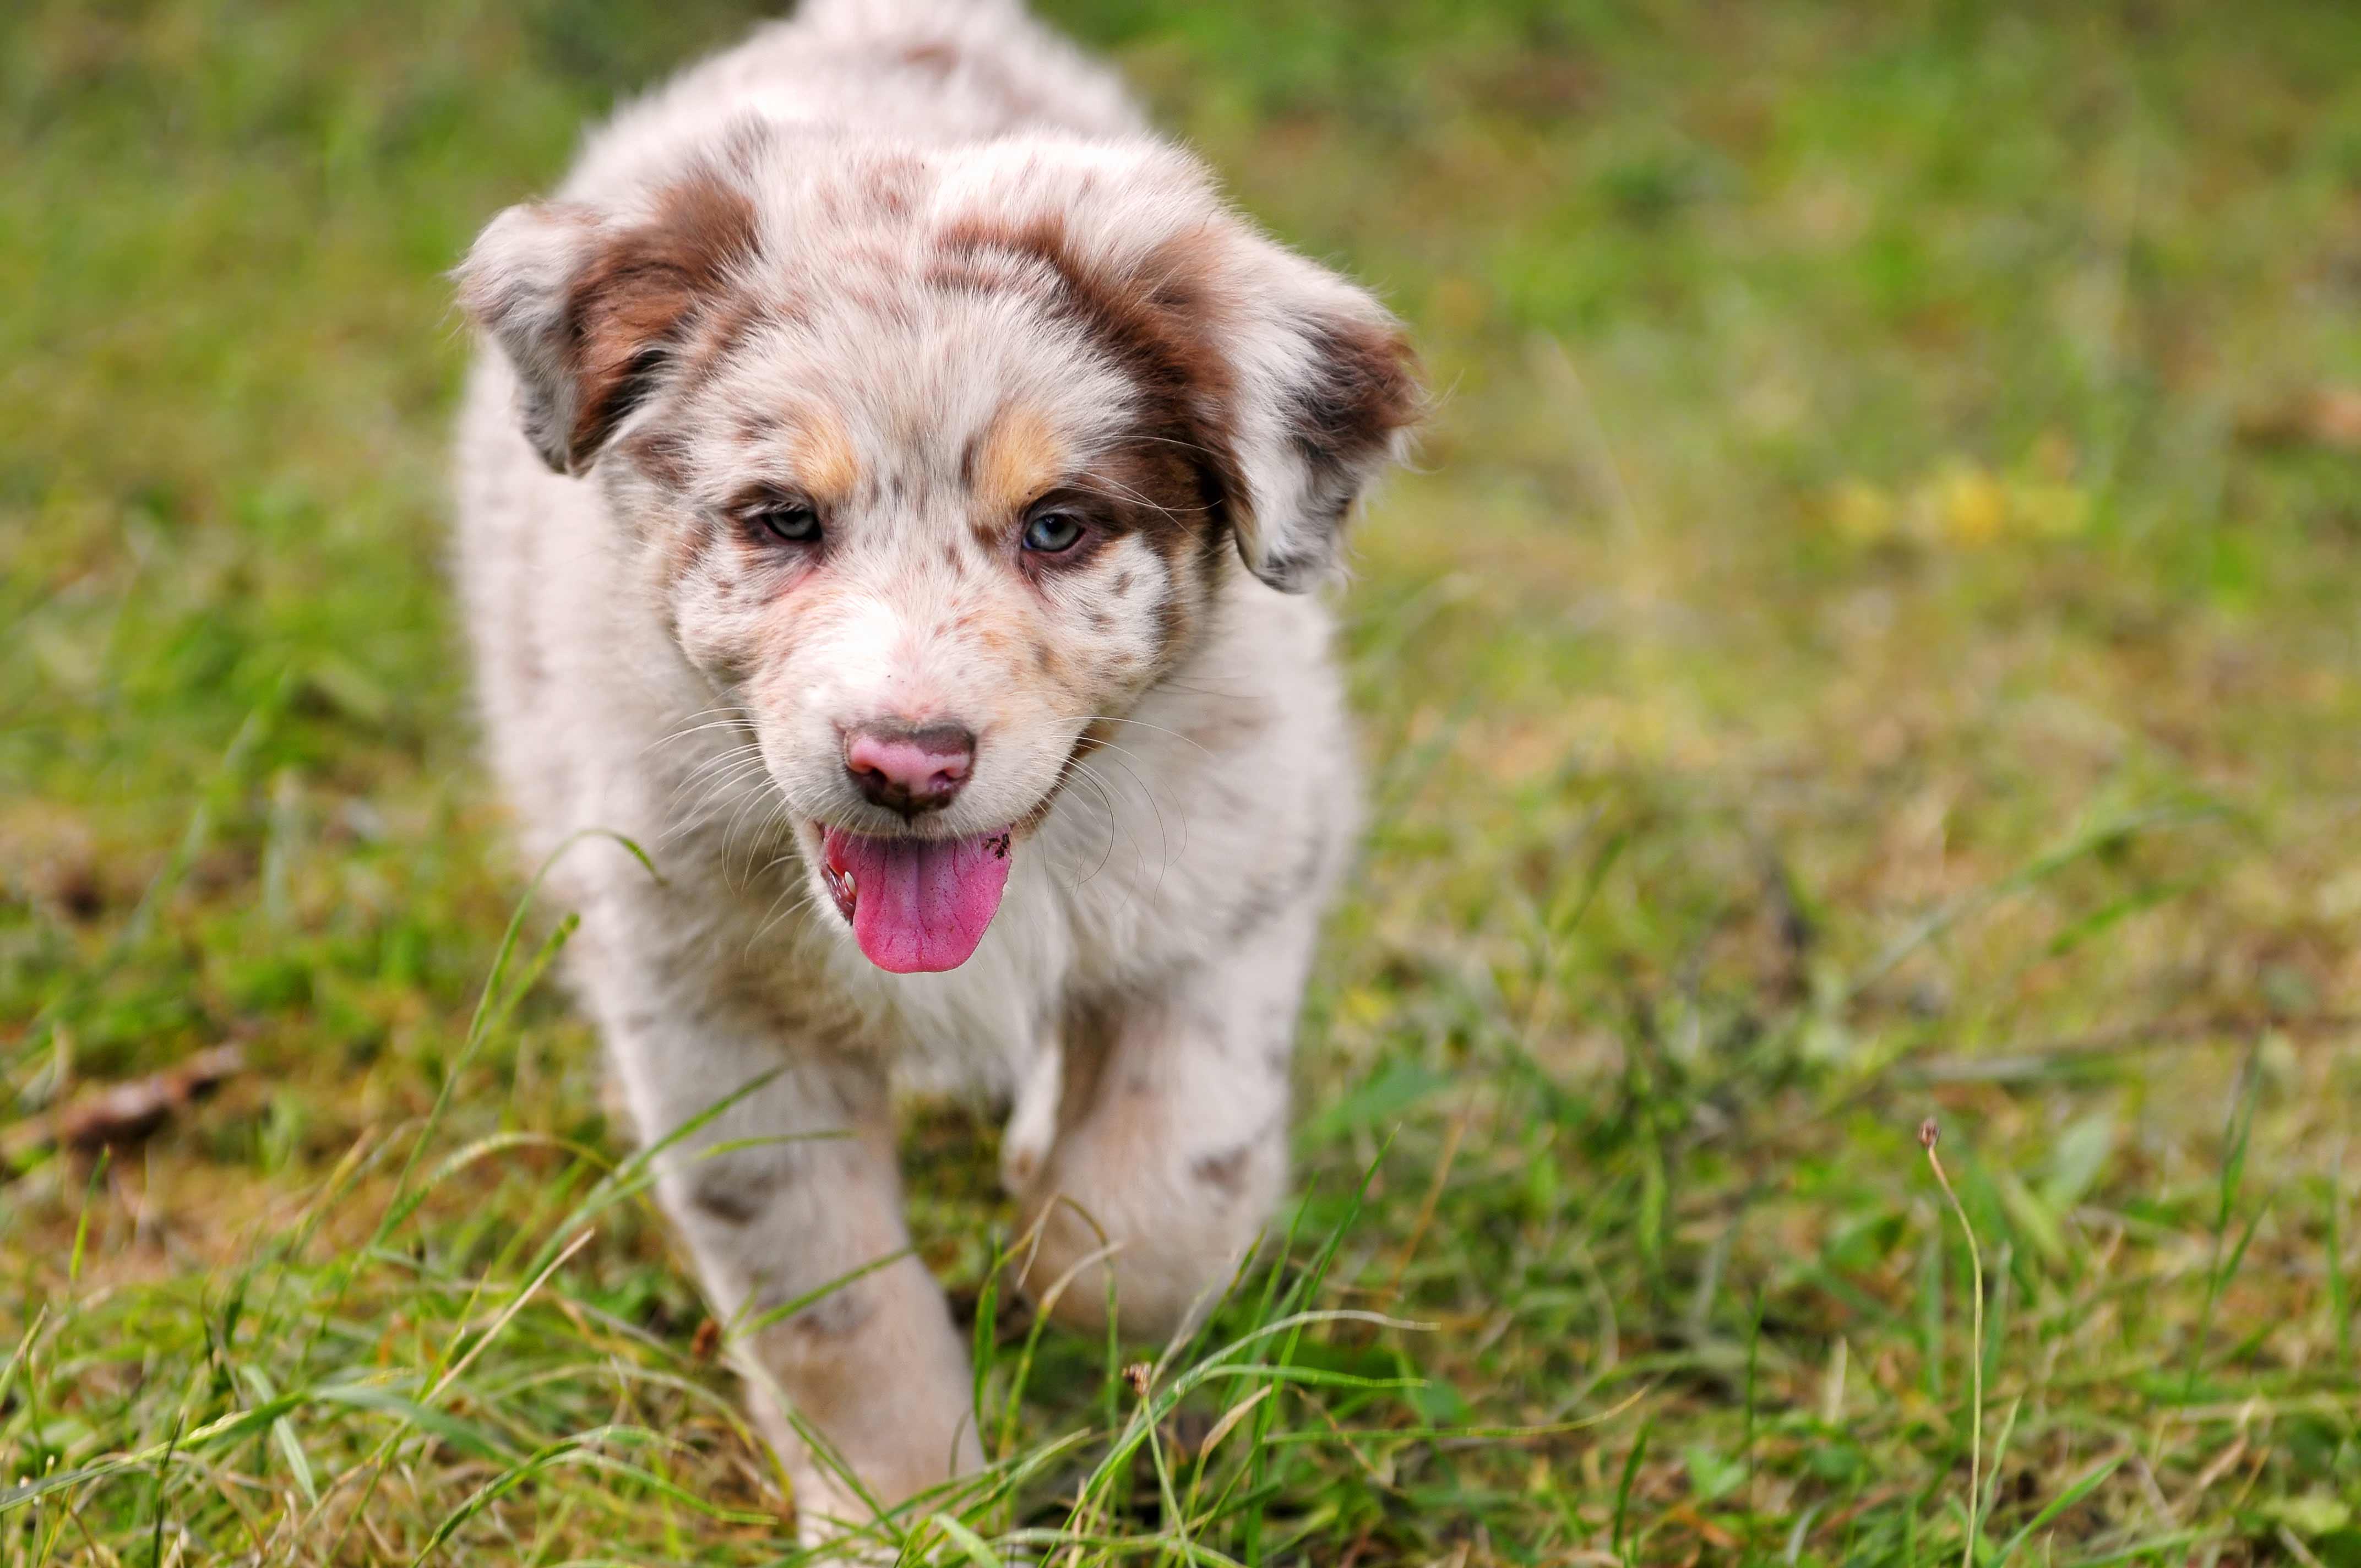 Australian Shepherd Dog Breed 187 Information Pictures Amp More